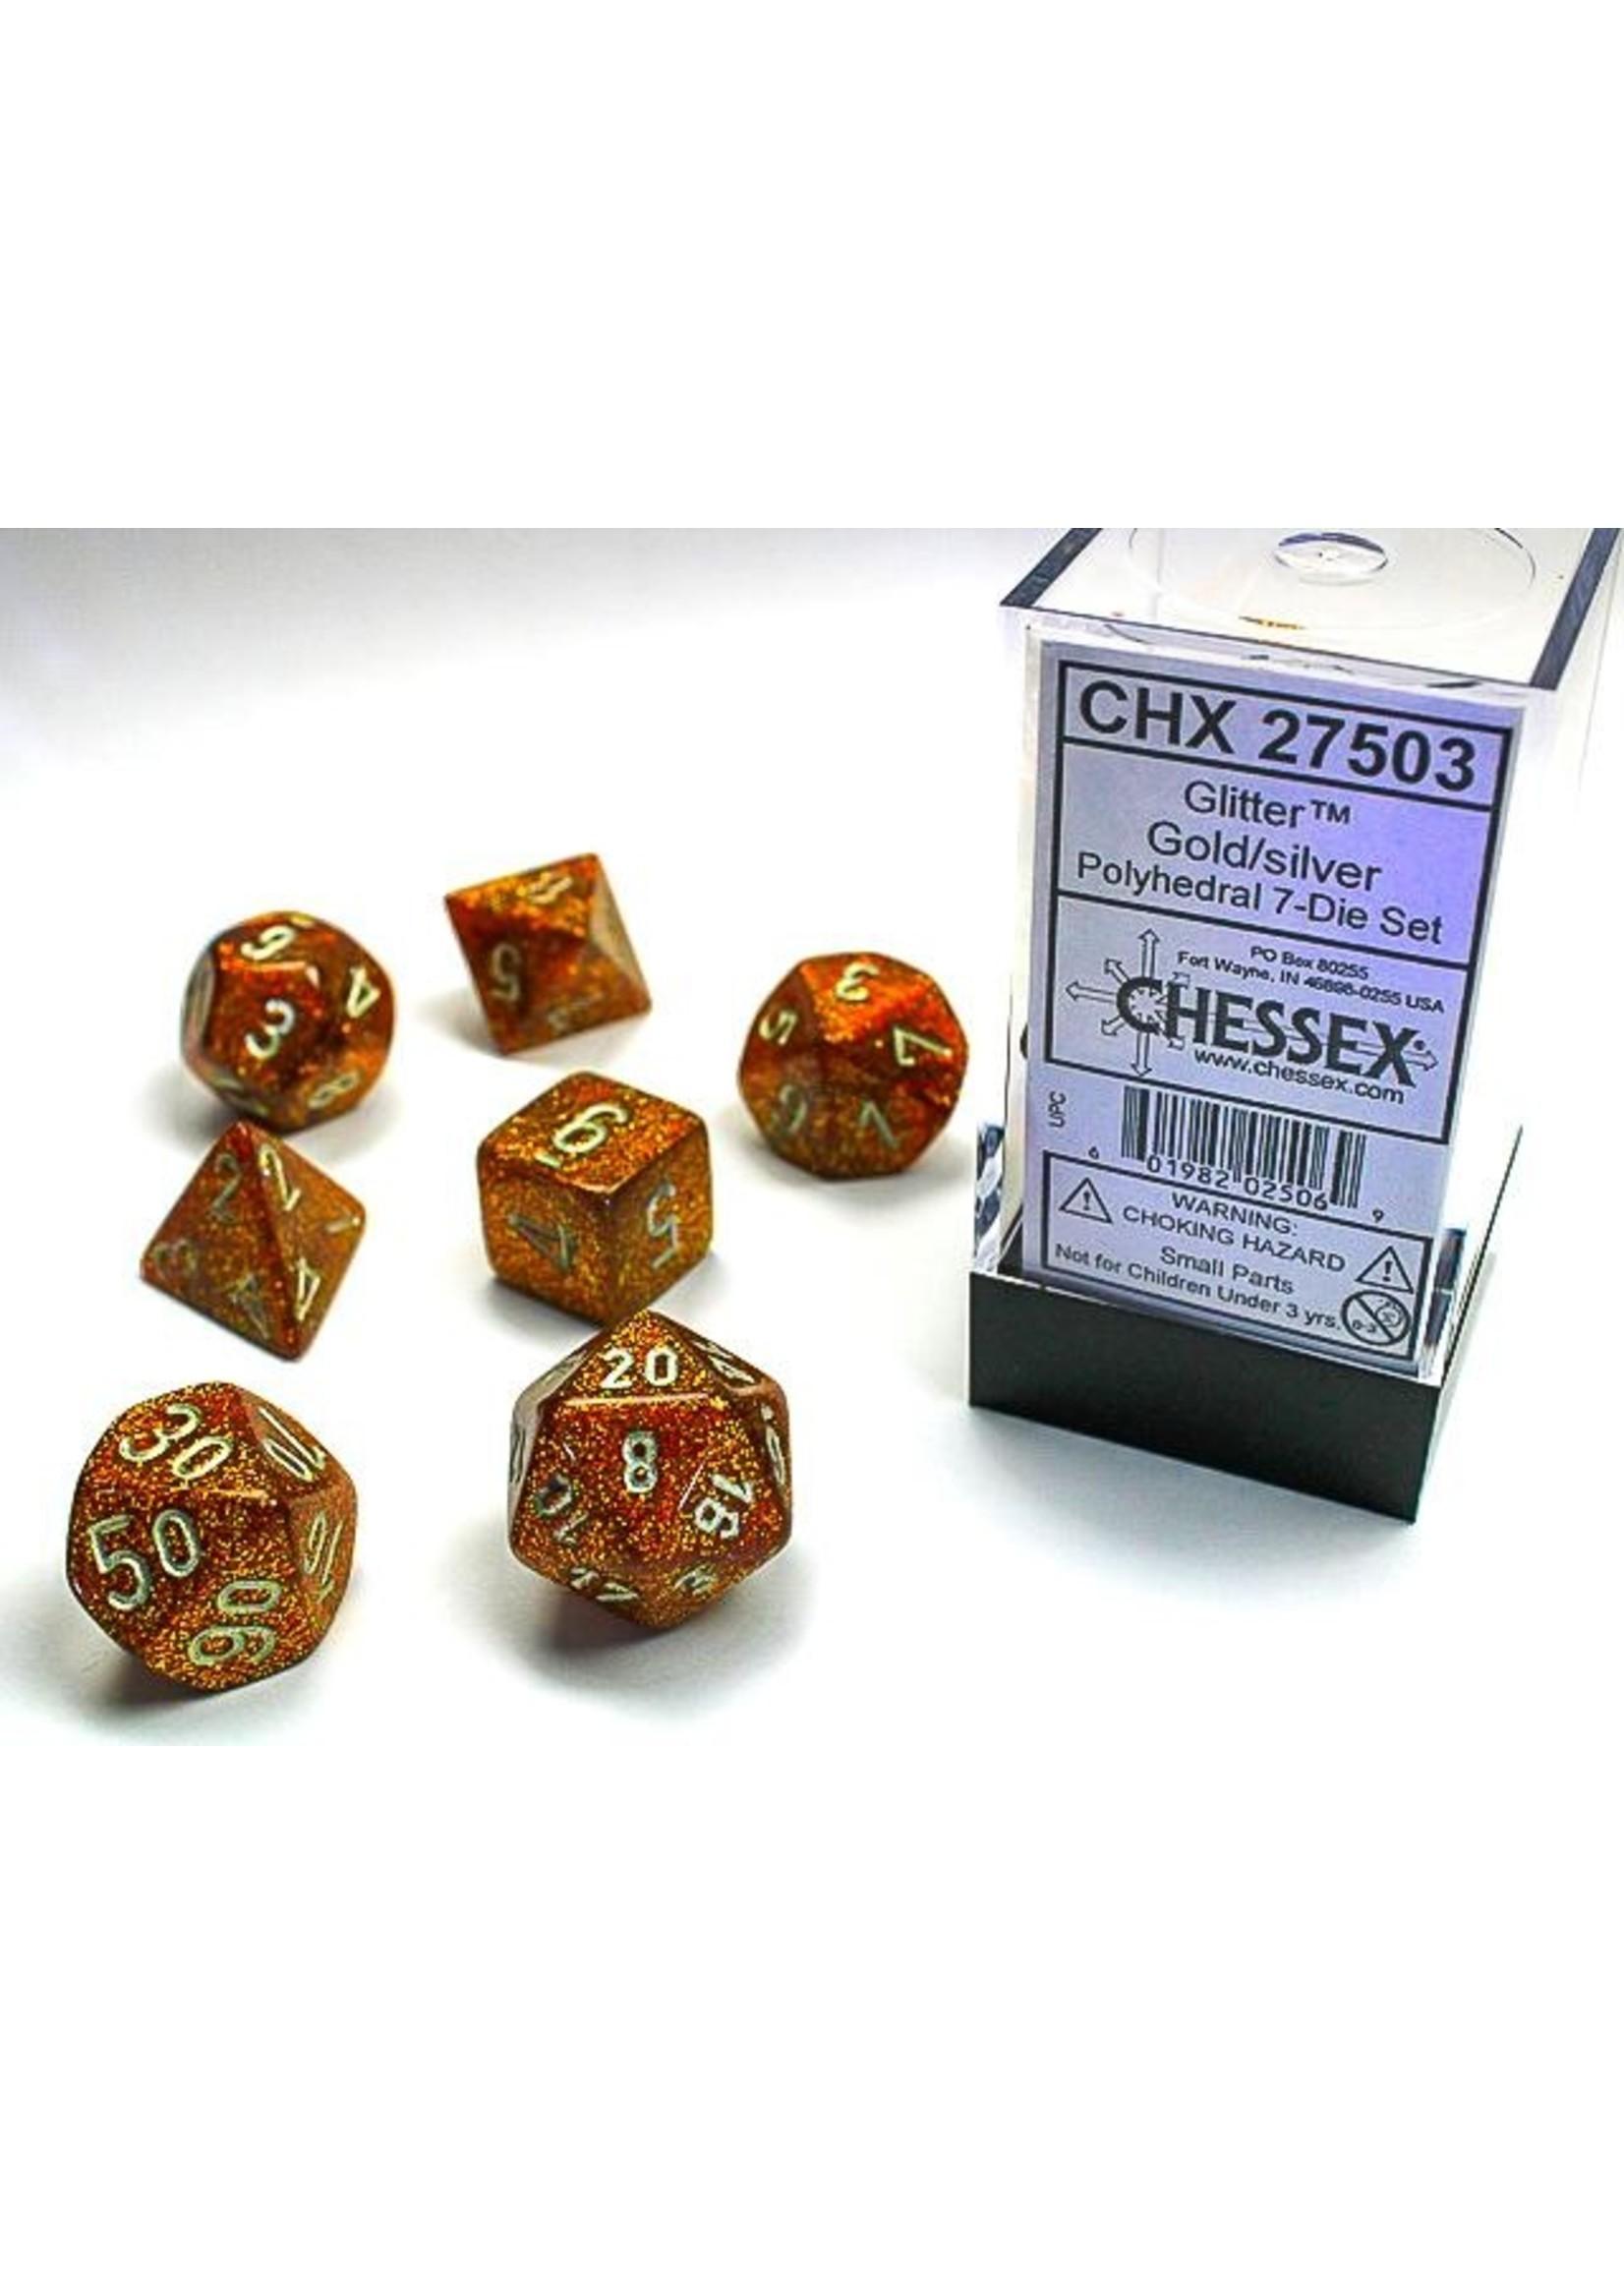 Glitter Gold/silver Polyhedral 7-Die Set